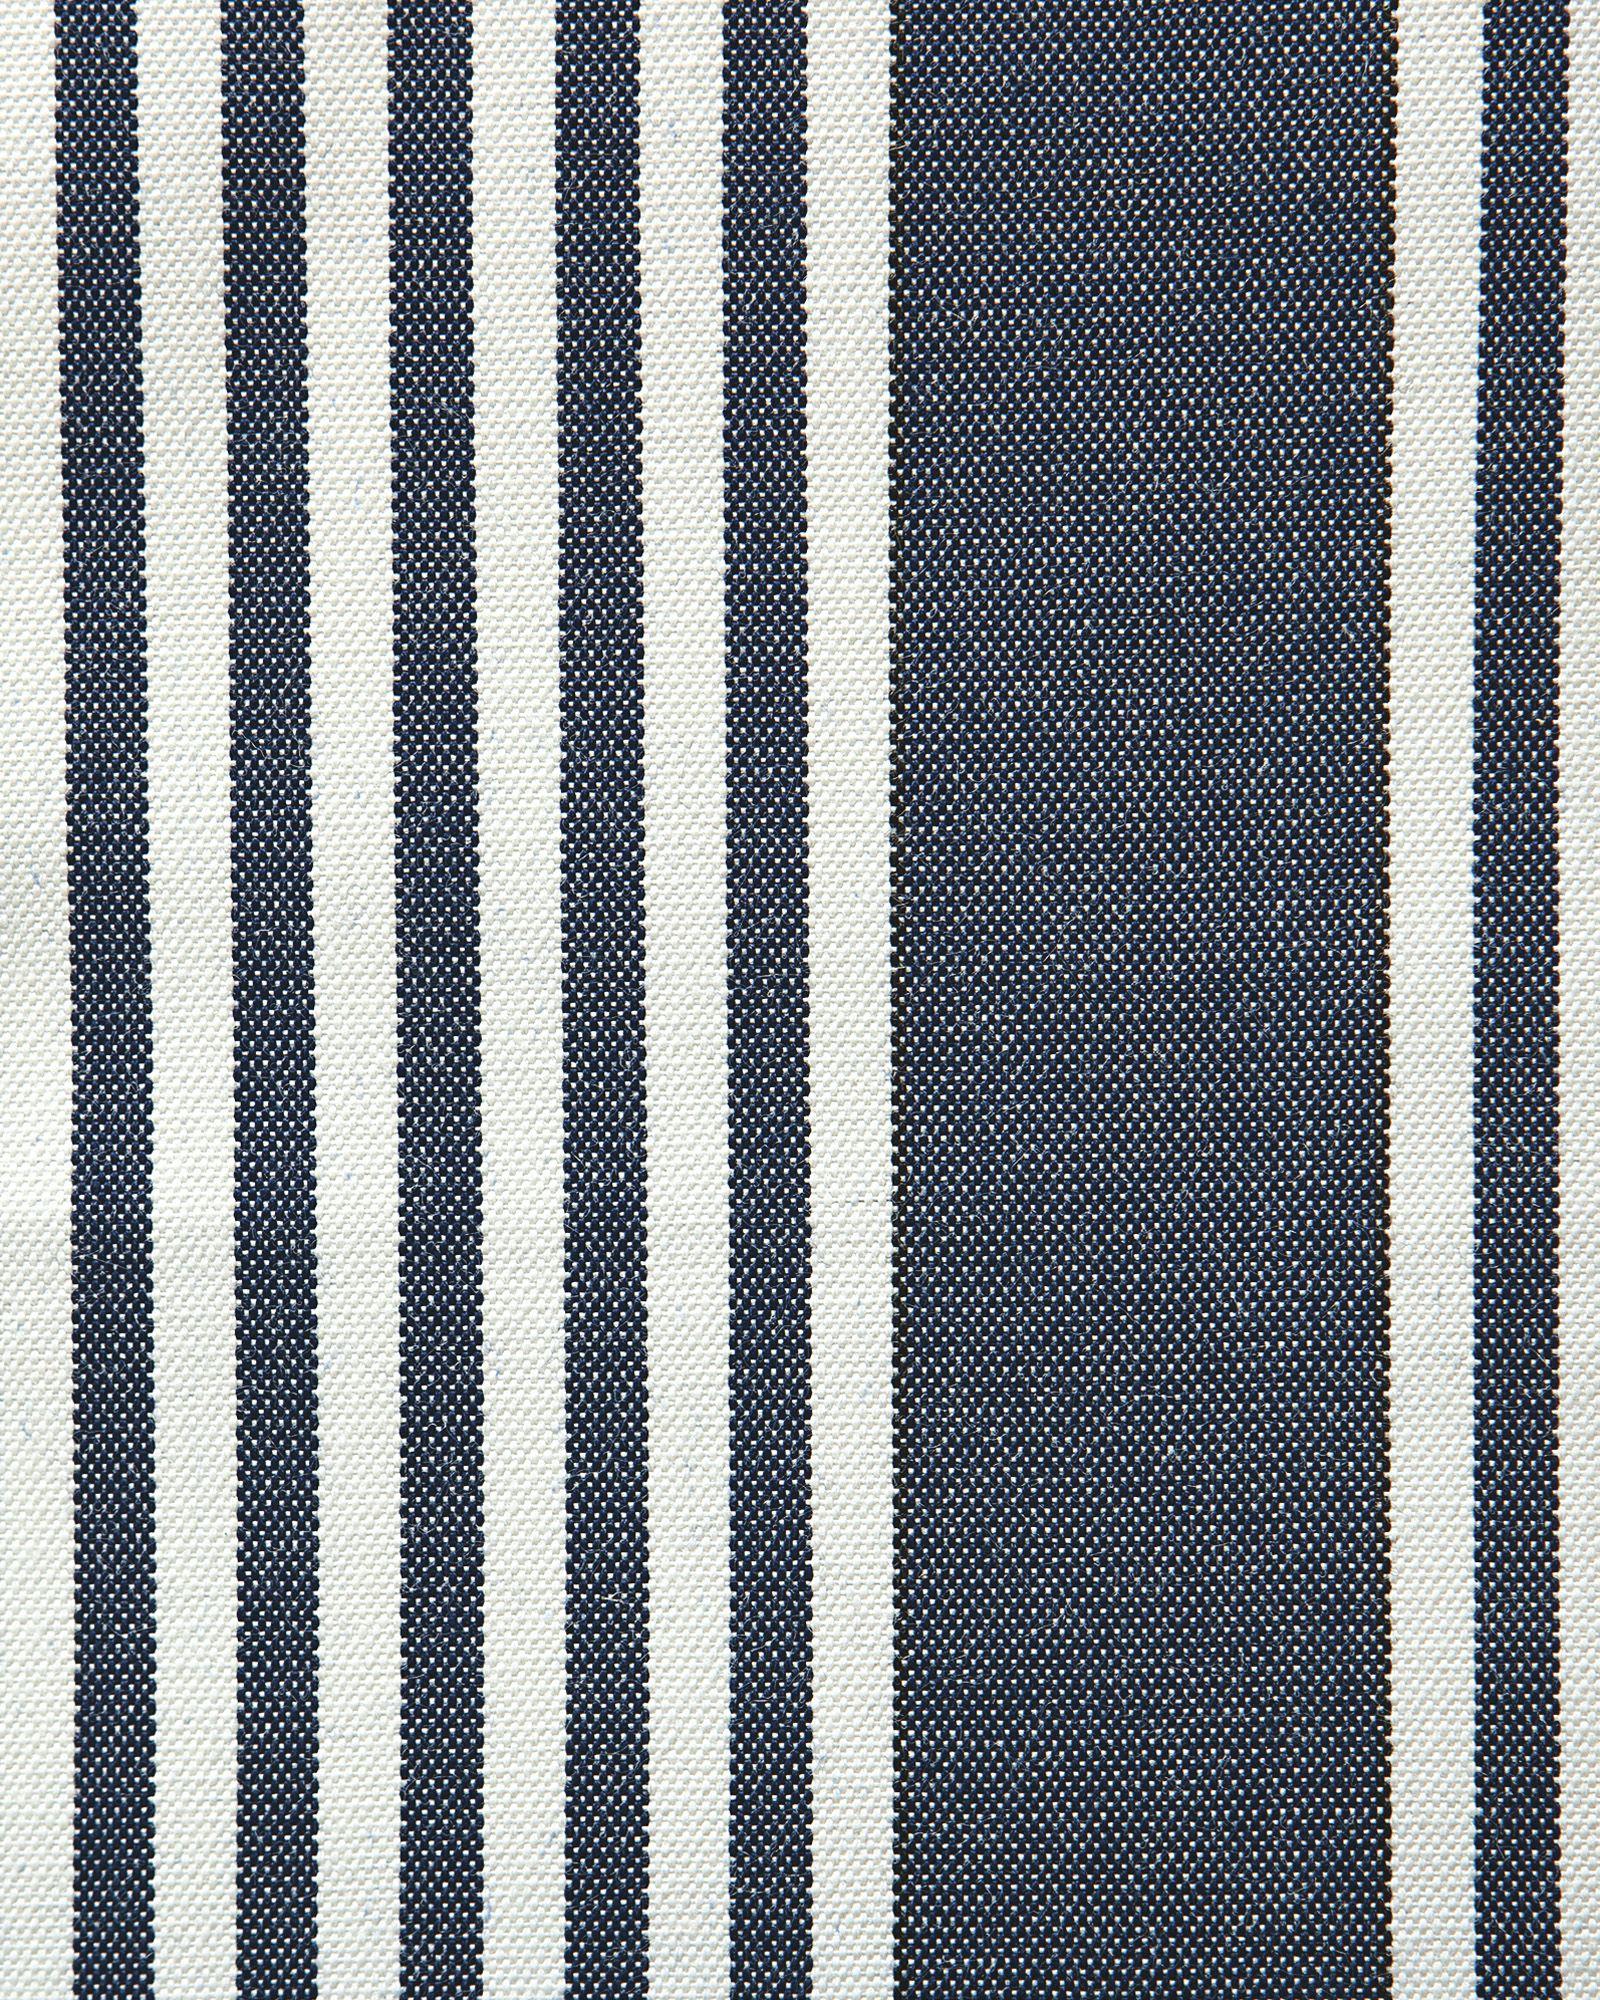 Fabric By The Yard Perennials Cabana Stripe Fabric Perennials Fabric Raised Bed Garden Design Fabric